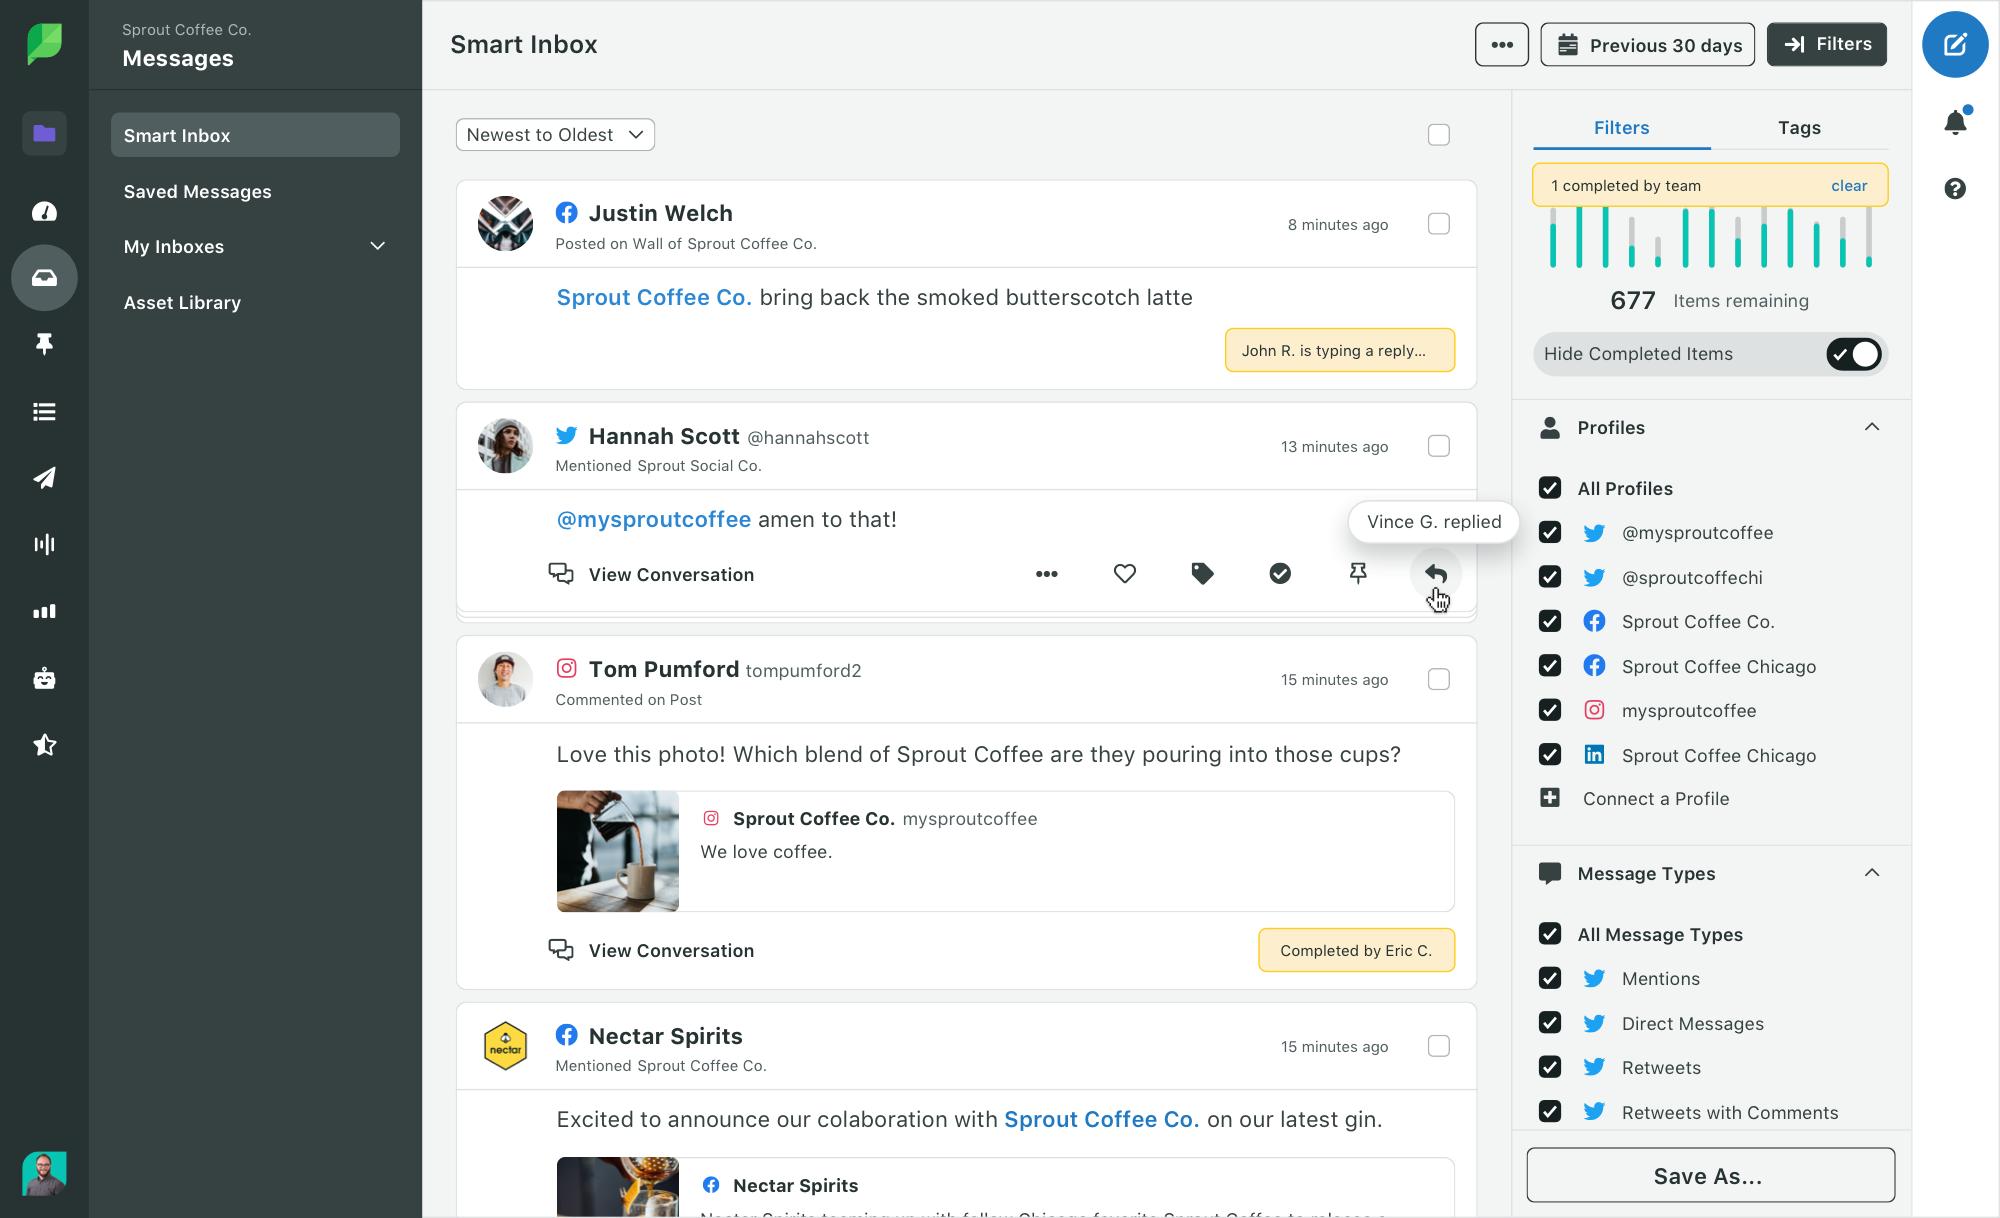 Sprout Social Smart Inbox - Showing Collision Detection Feature